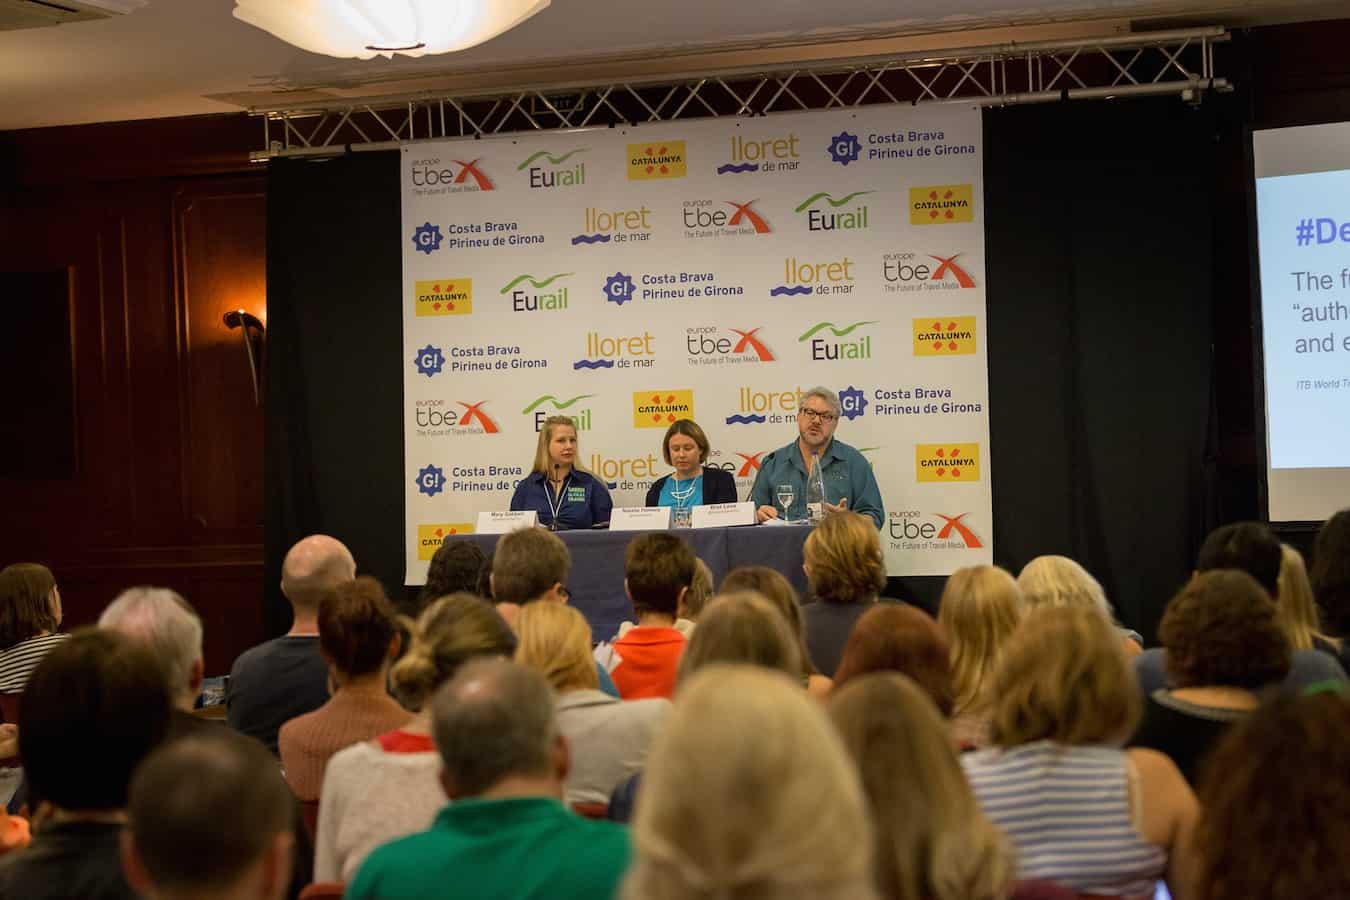 Bret Love & Mary Gabbett speak on Journalism Skills at TBEX Costa Brava